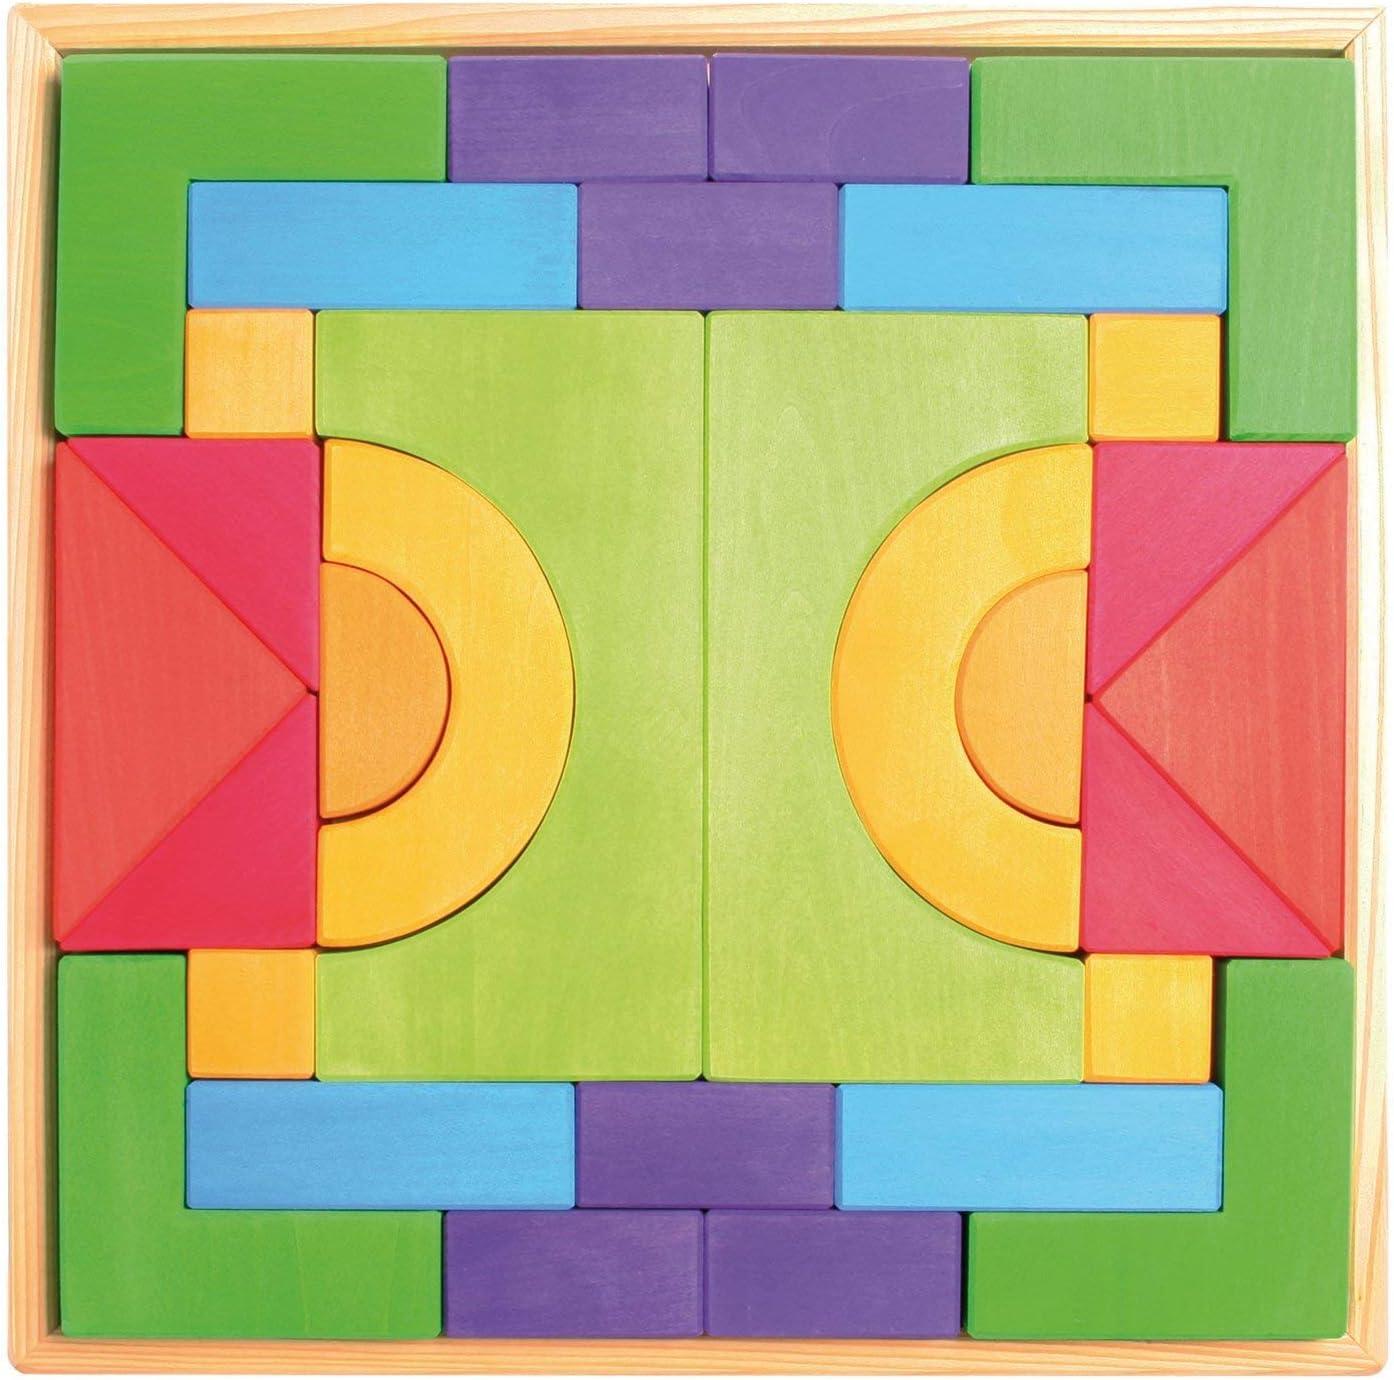 Grimm'S Large Basic Building Satz - Handmade Wooden Modular Blocks, 30 Pieces bei 17-Inch Storage Tray (4X4 Size)